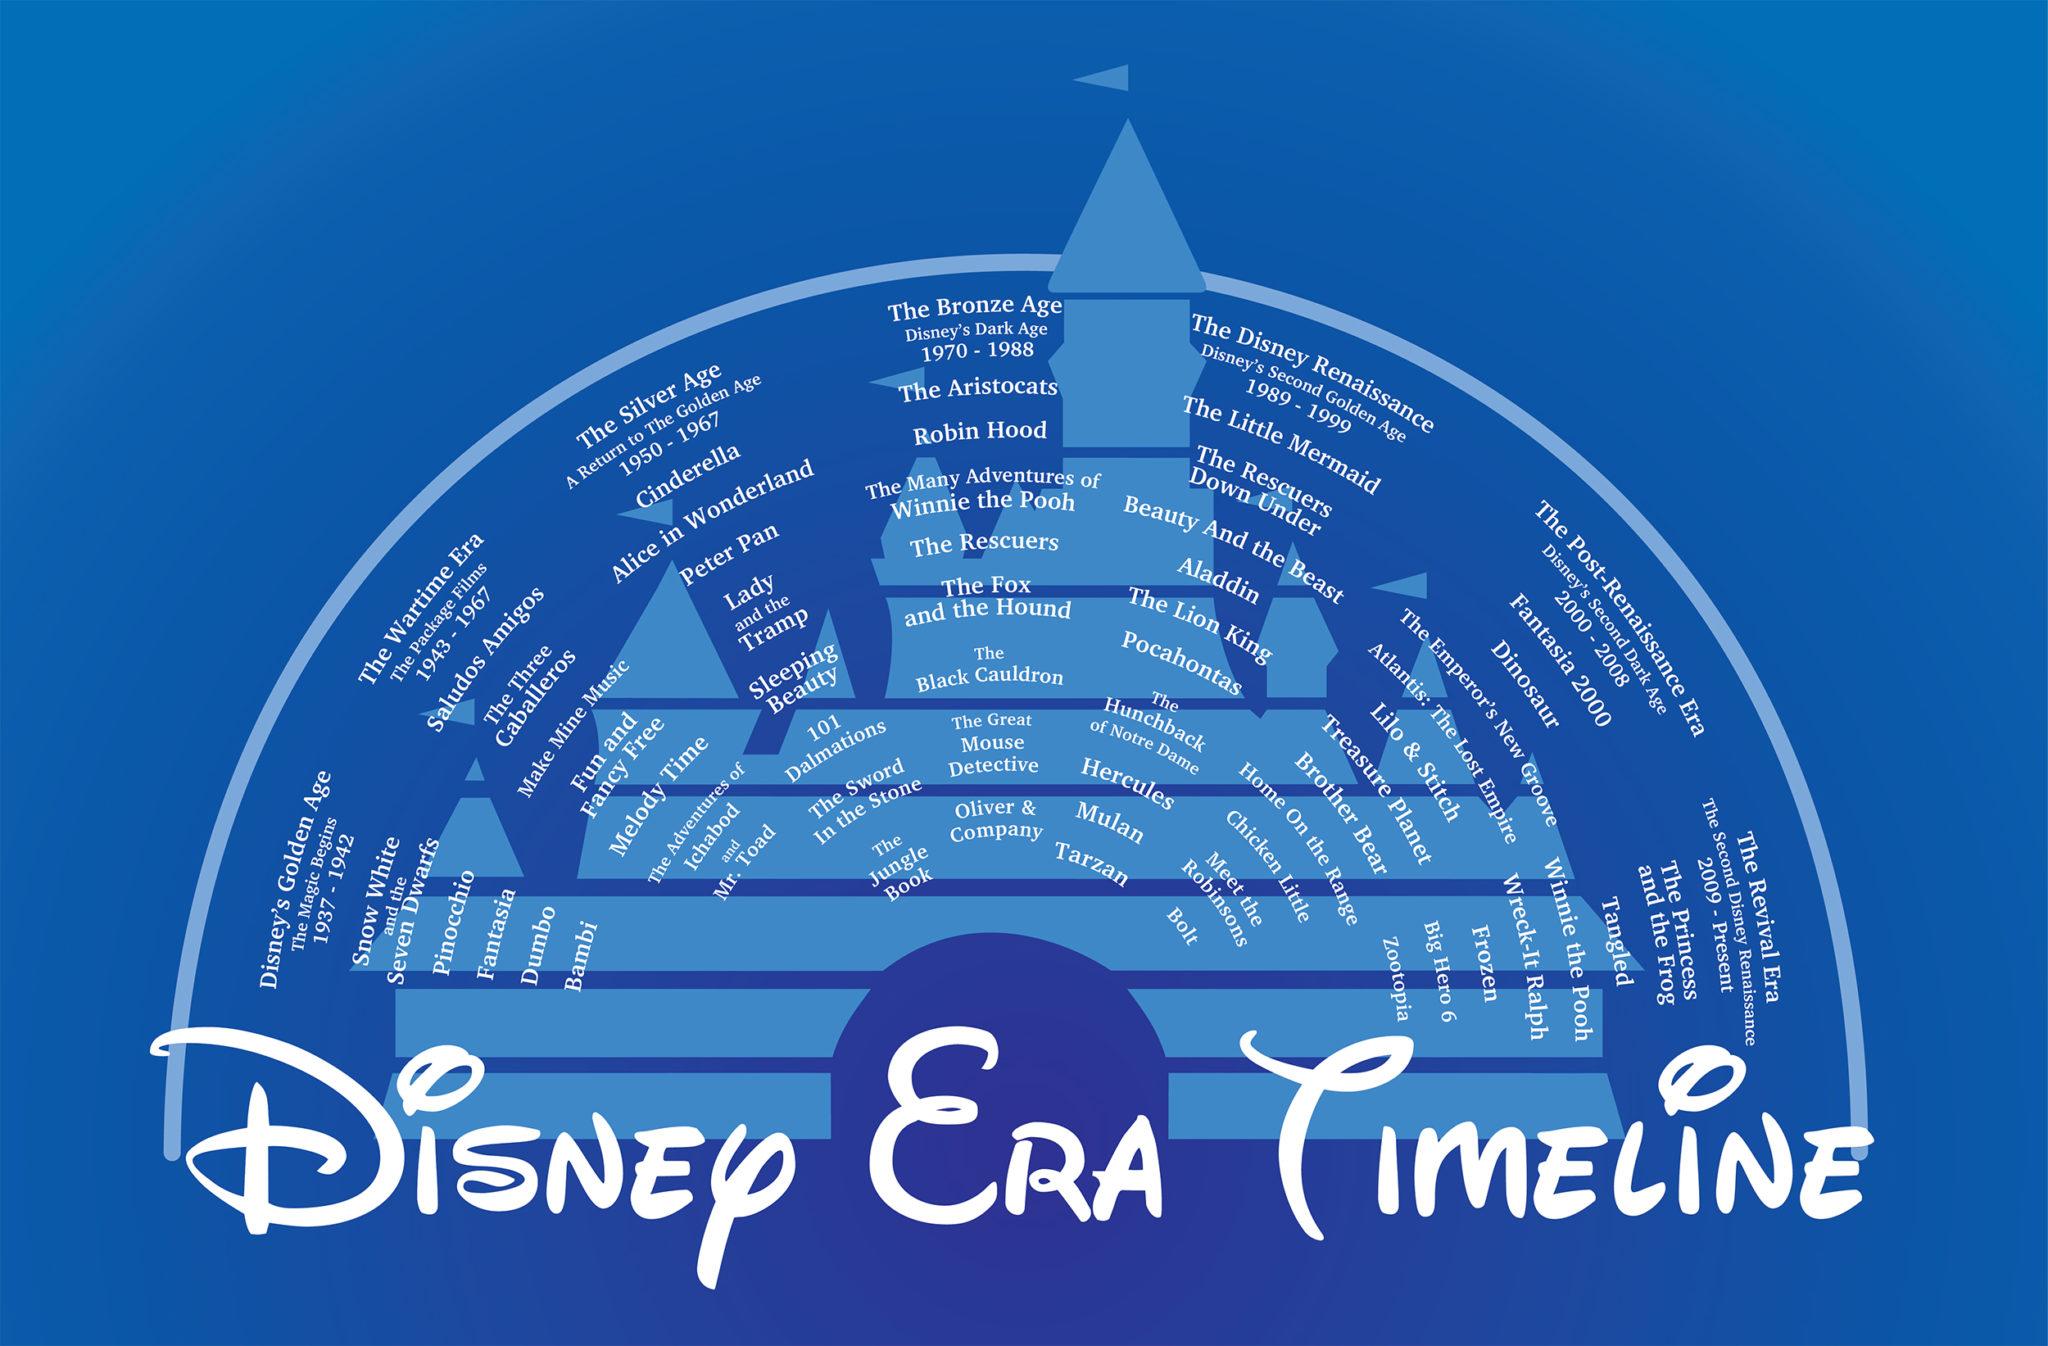 DisneyEraTimeline